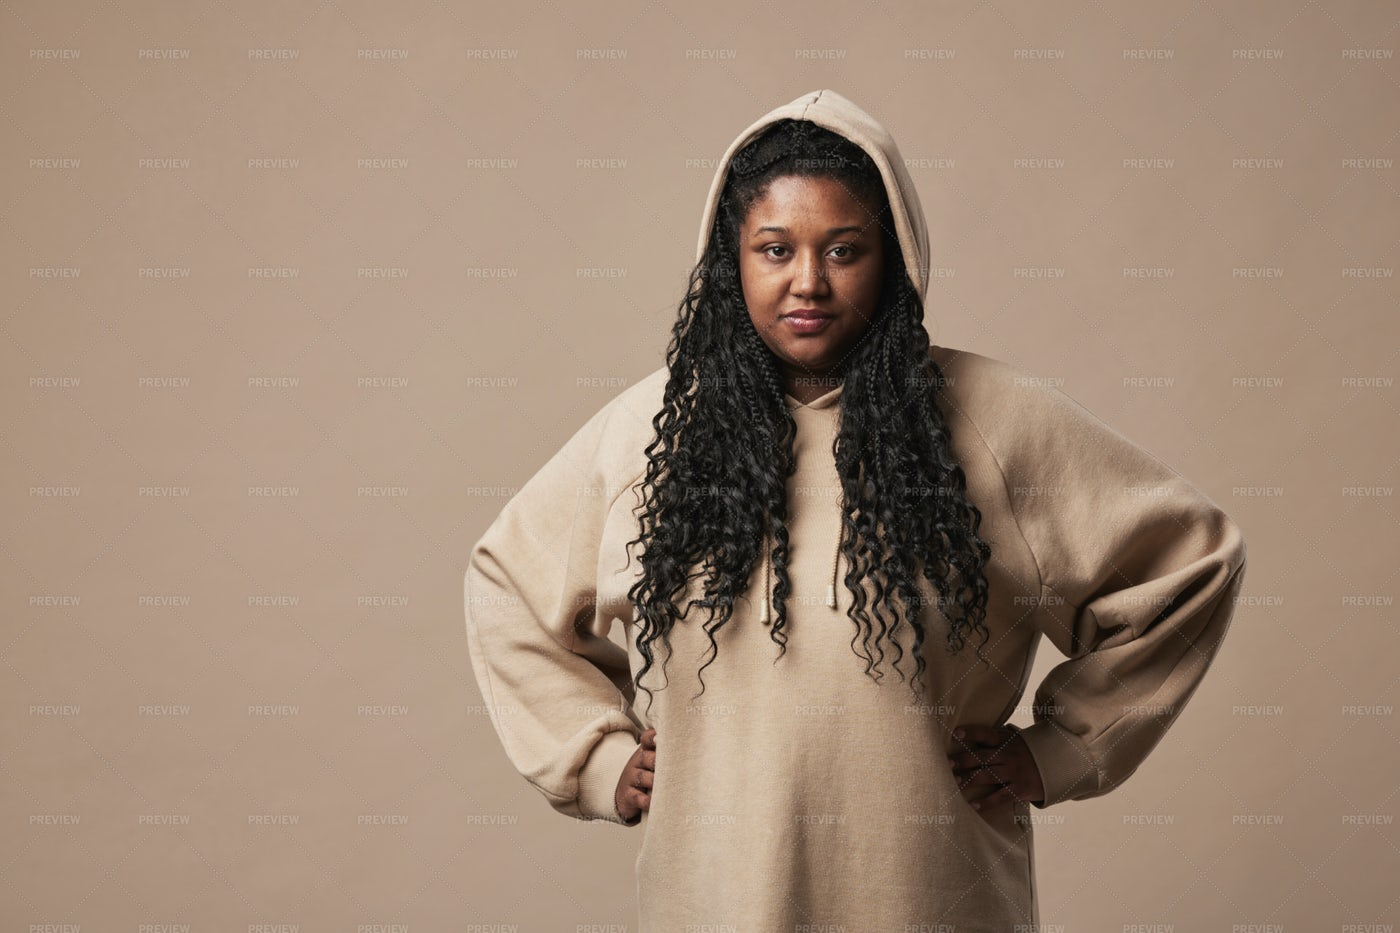 Confident Woman In Hoodie Portrait: Stock Photos